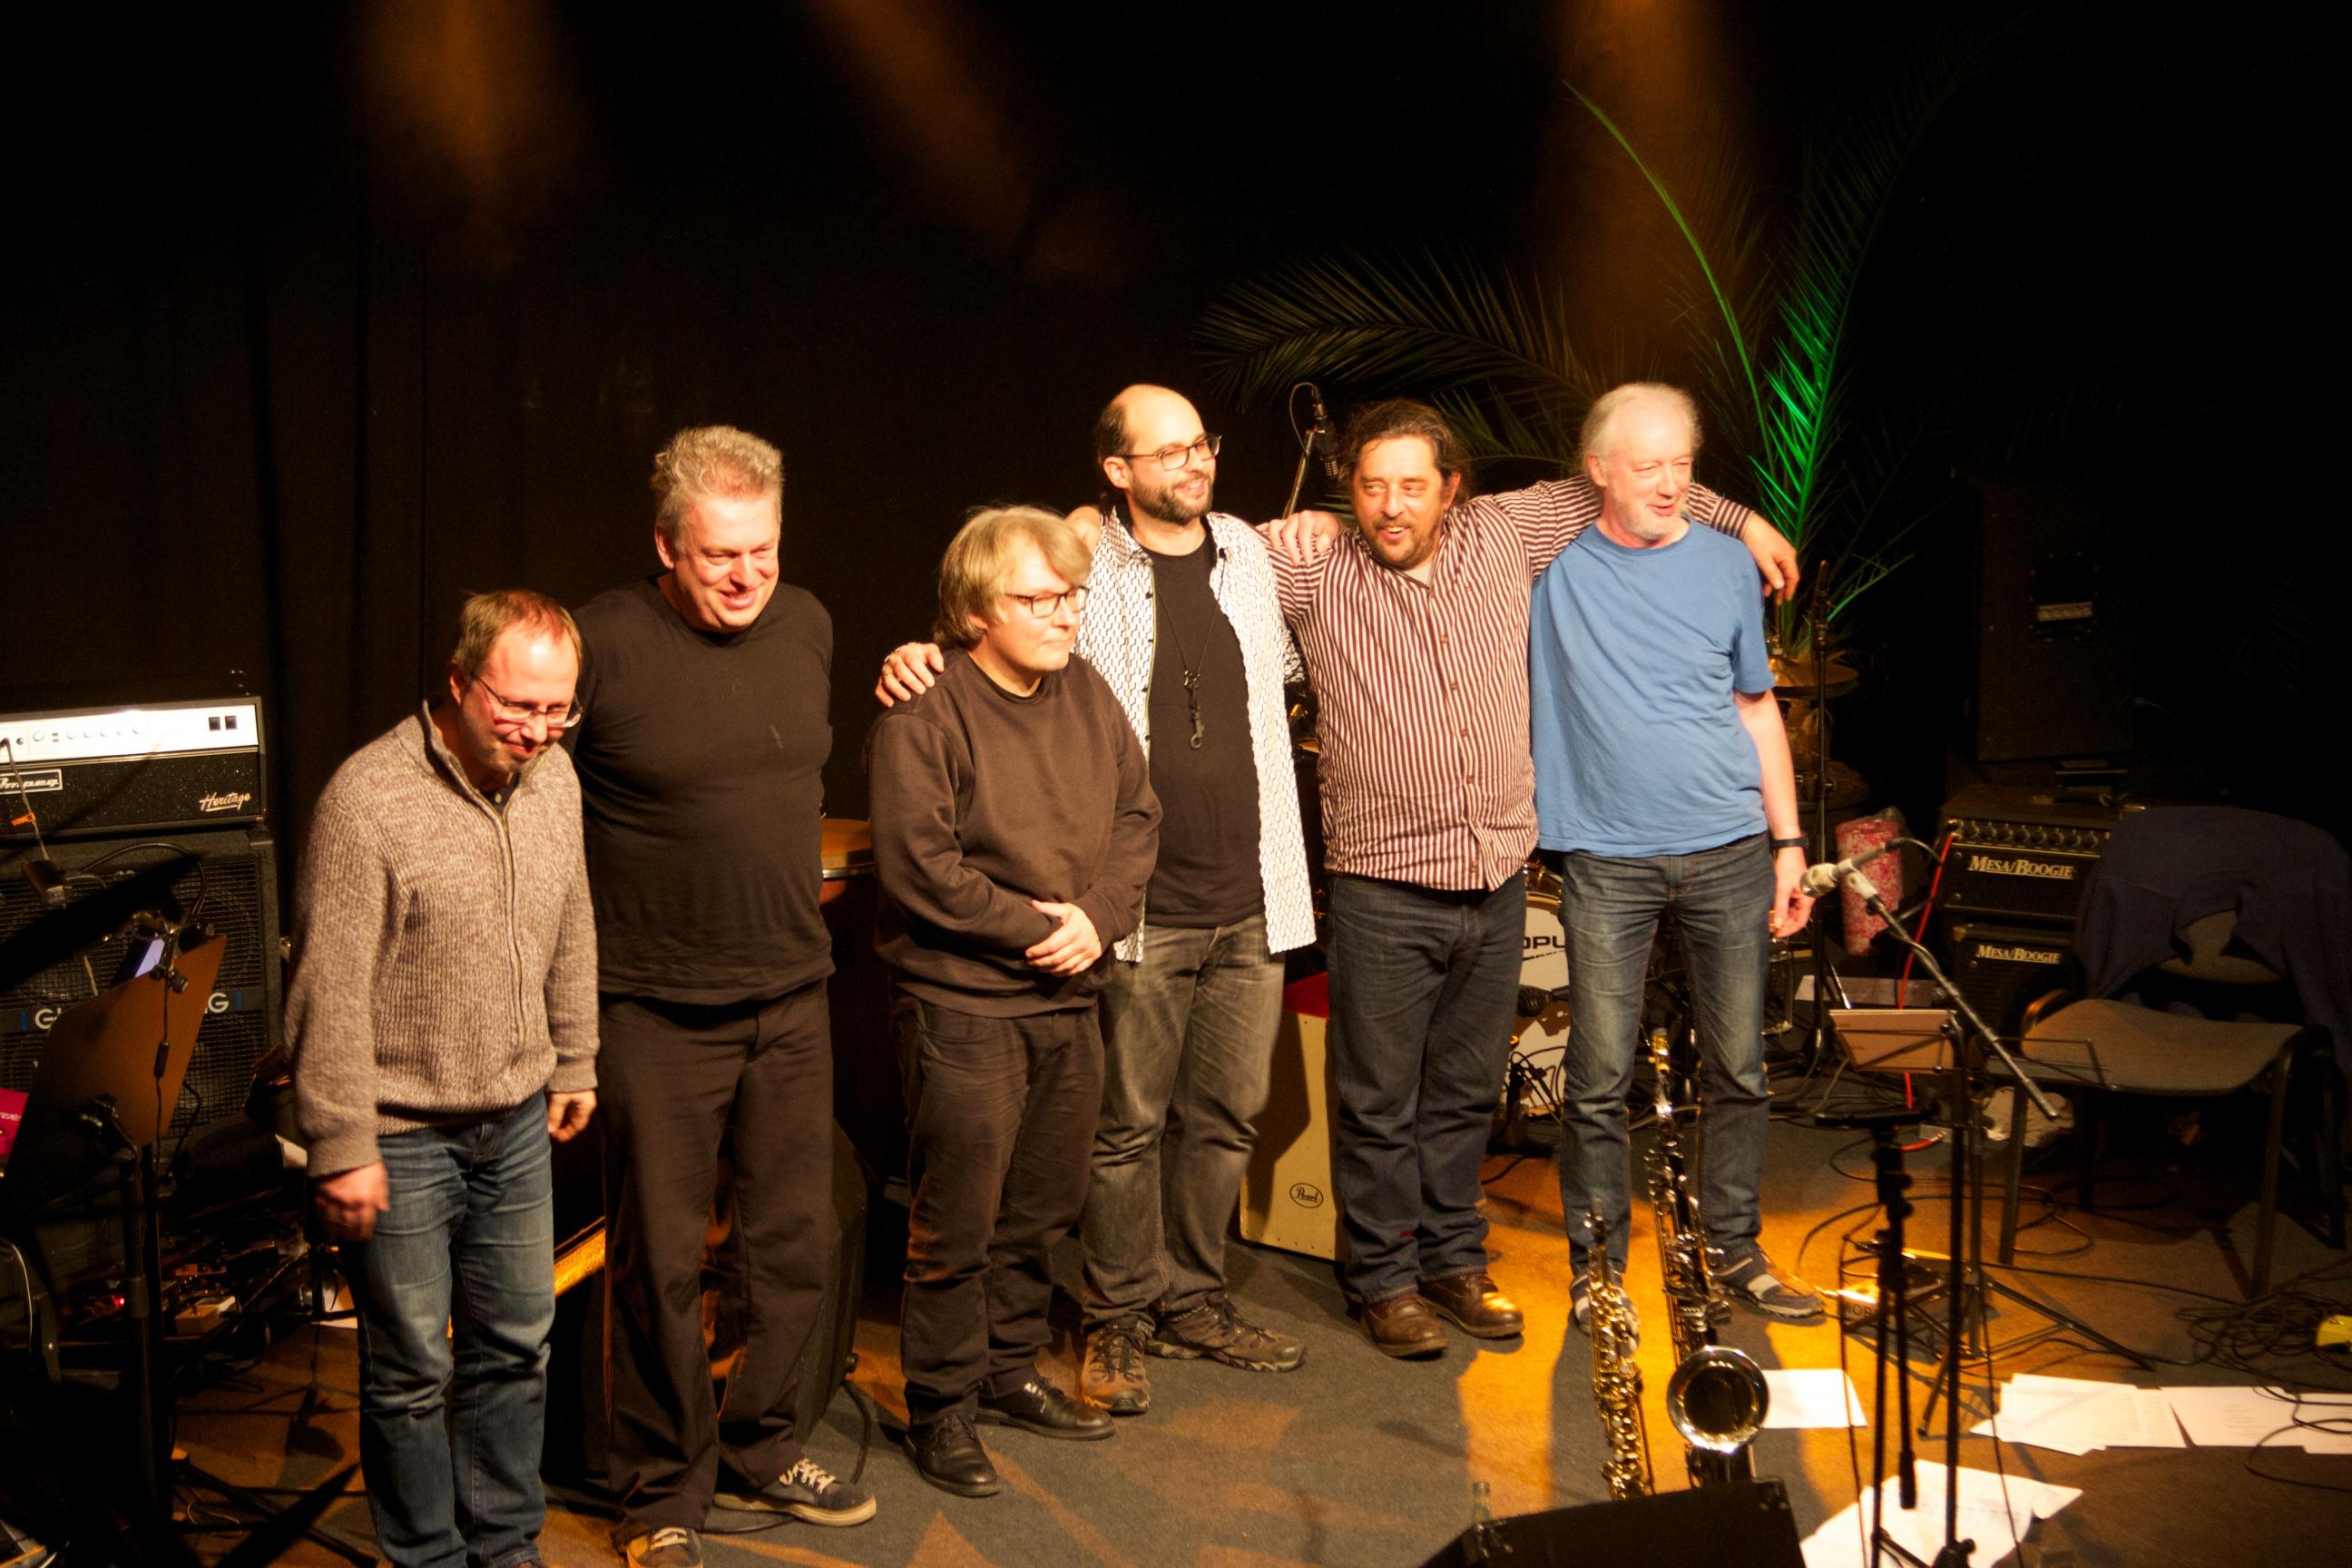 18-01-27-Konzert-Eurovoodoo-Becker-und-Funck-DN-234